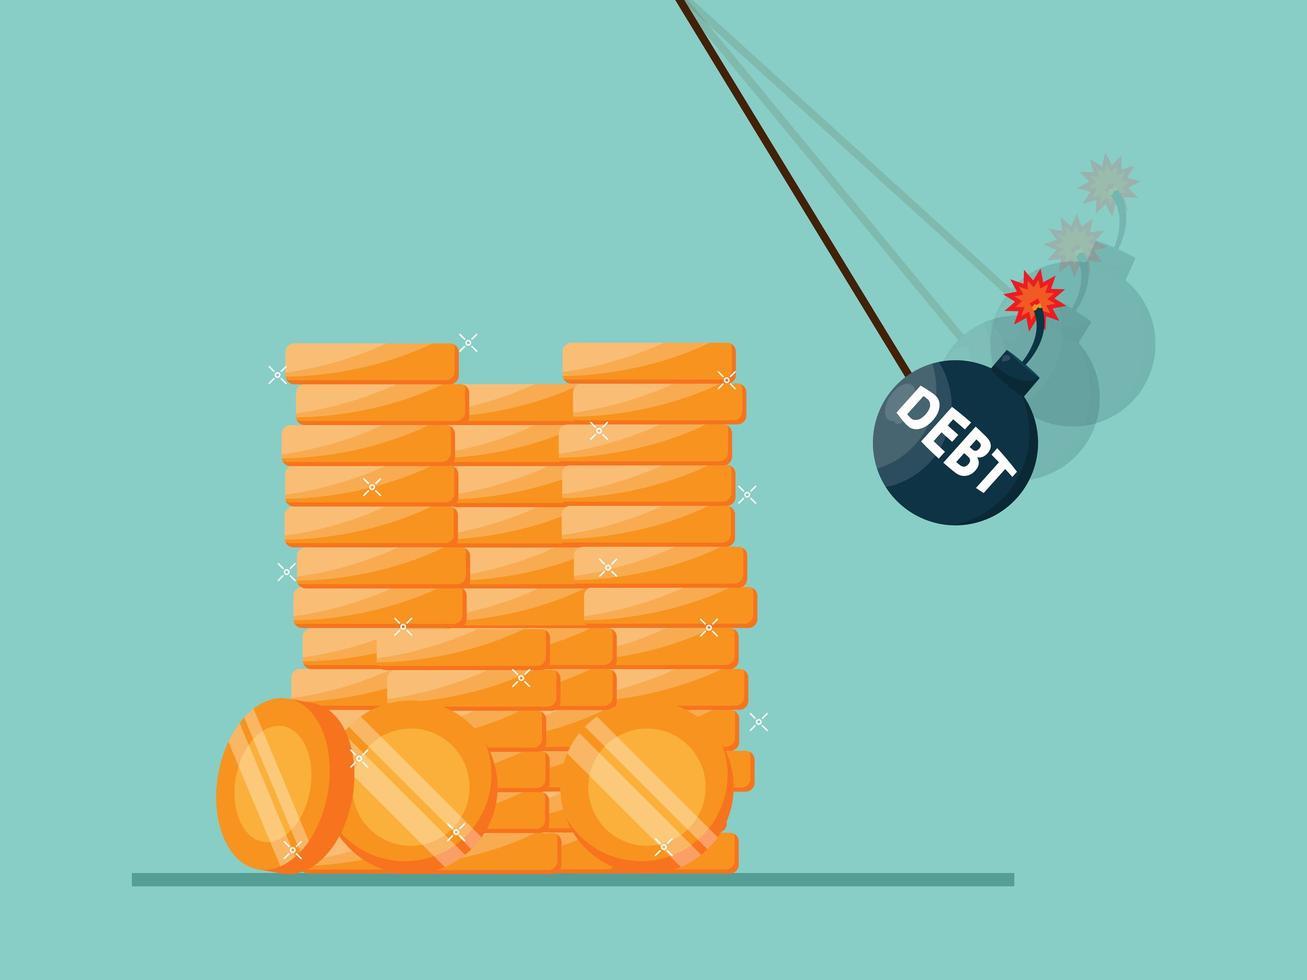 debt bomb destroys stack of money coins, economic crisis vector